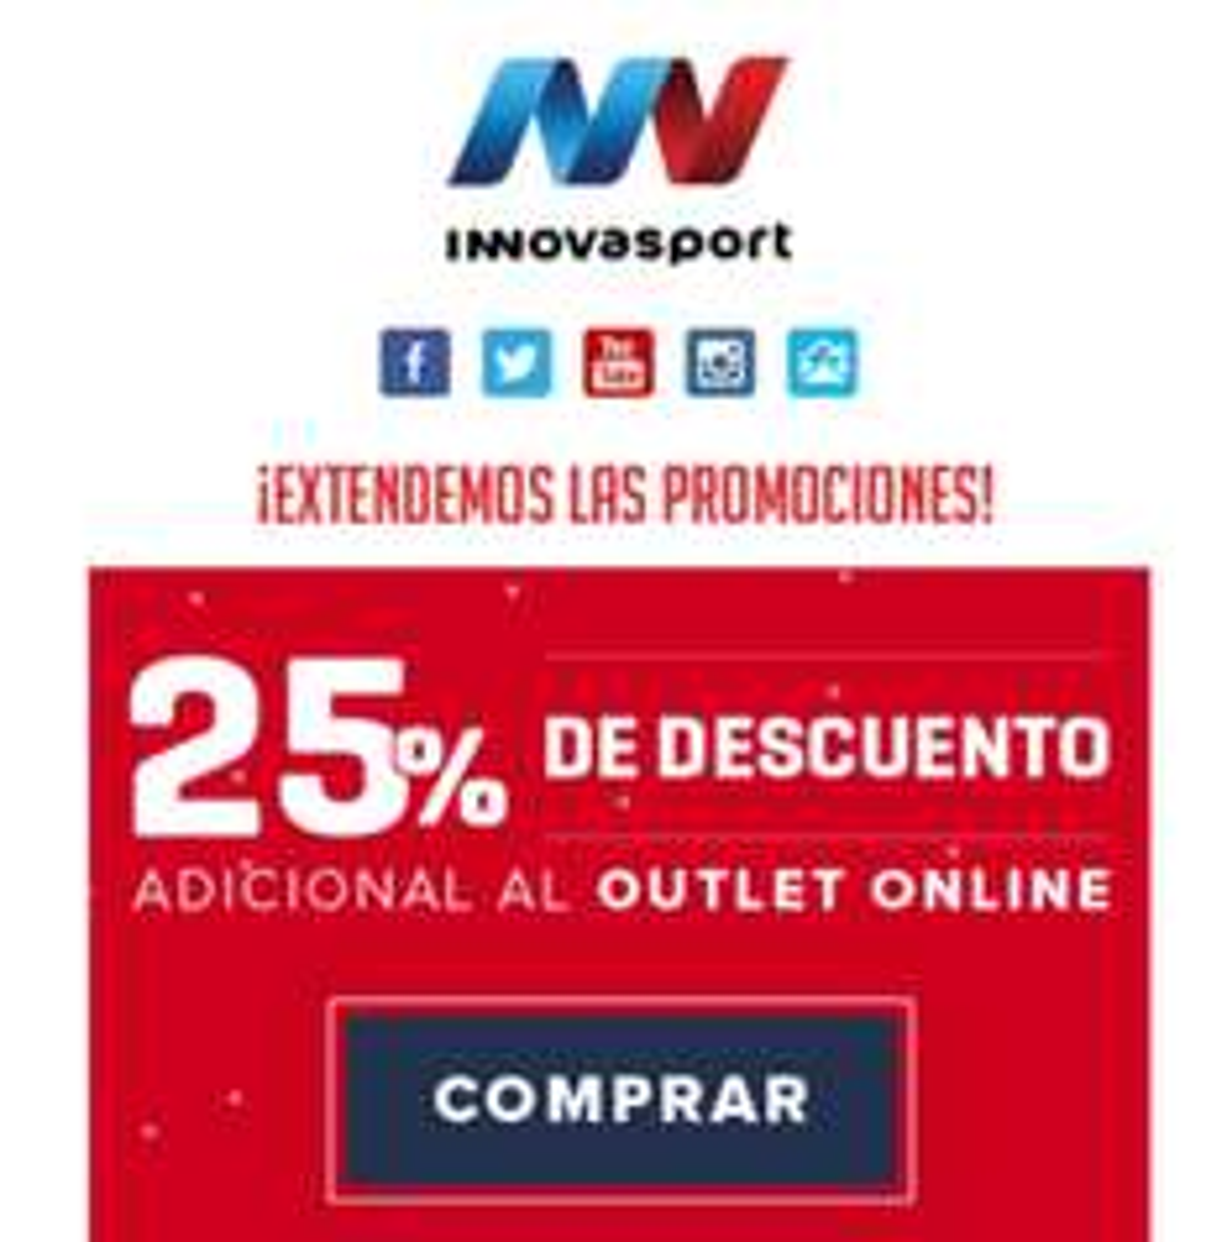 Innovasport: 25% adicional al outlet